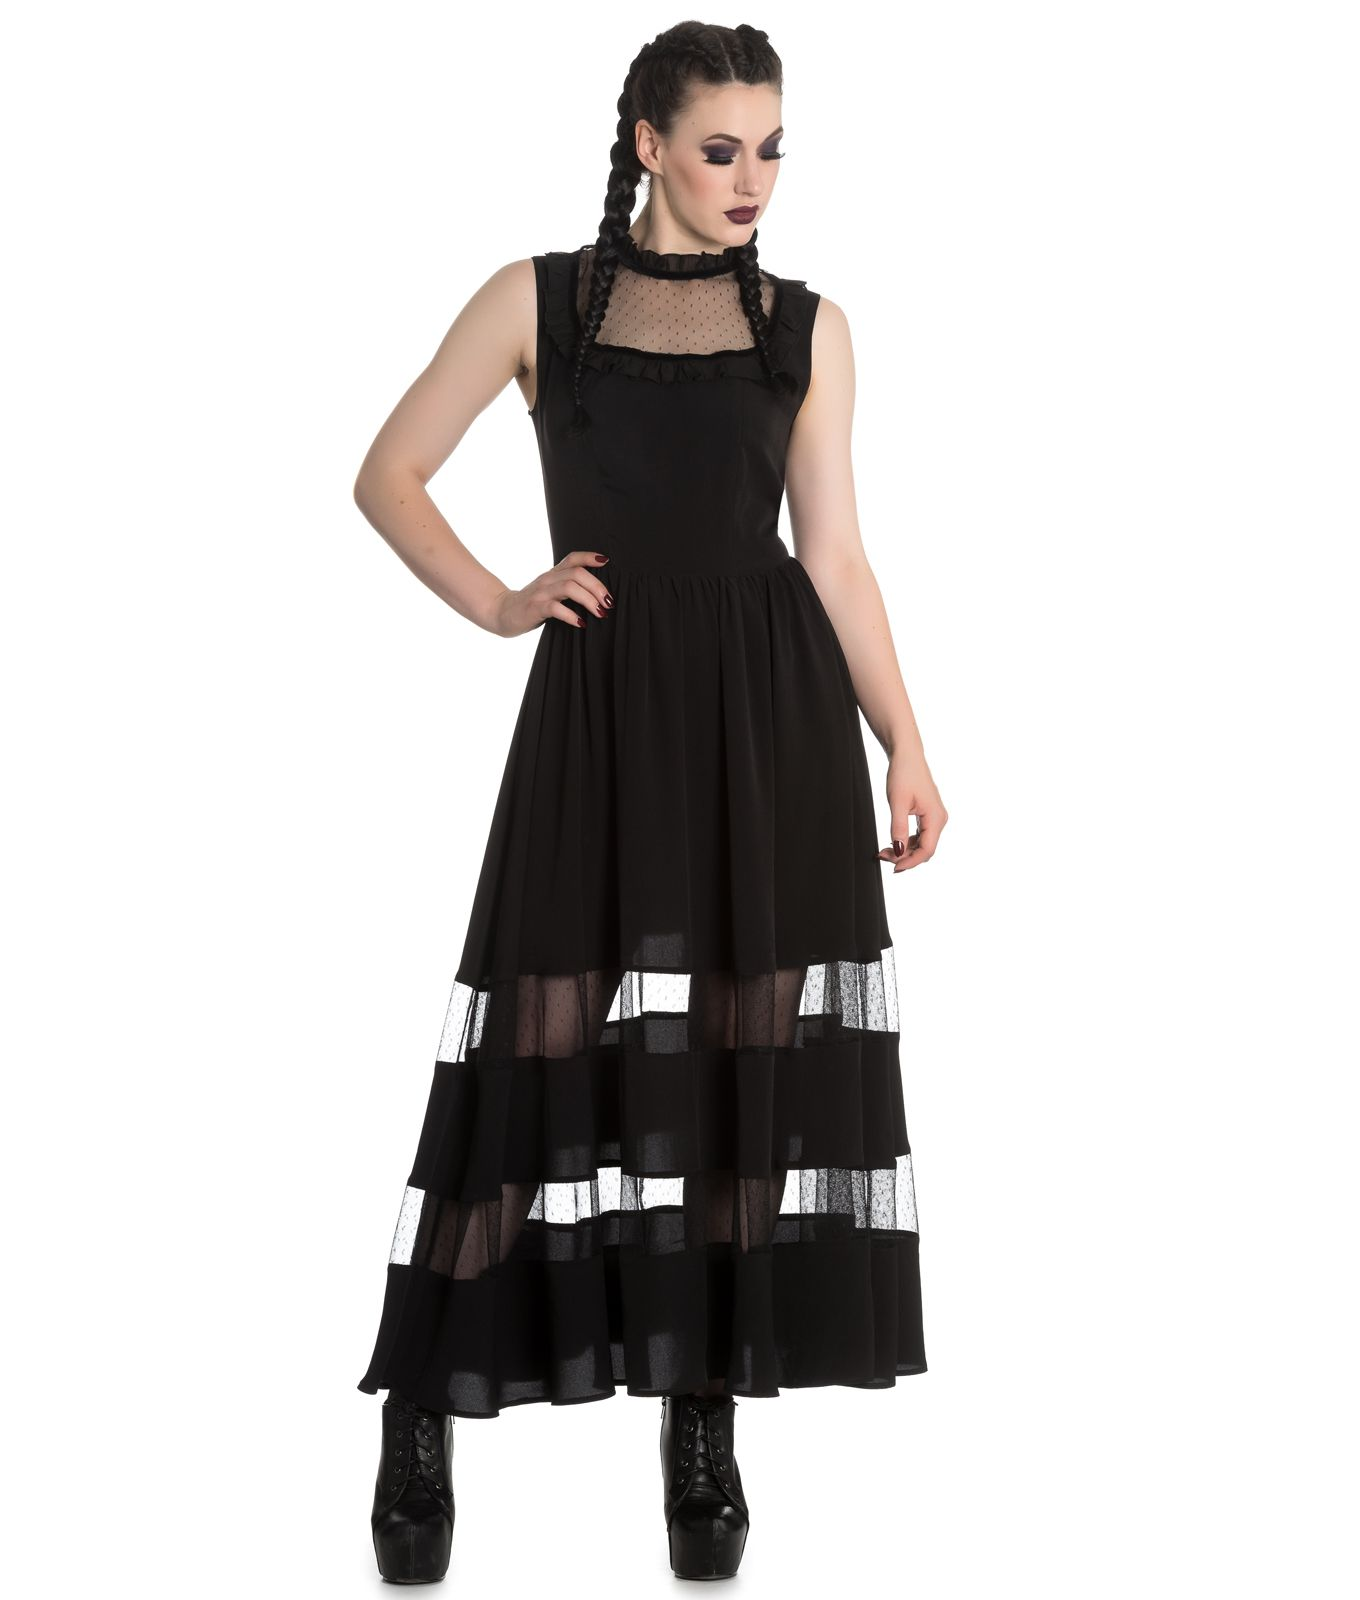 Spin Doctor Bellatrix Maxi Long Alternative Gothic Dress Black